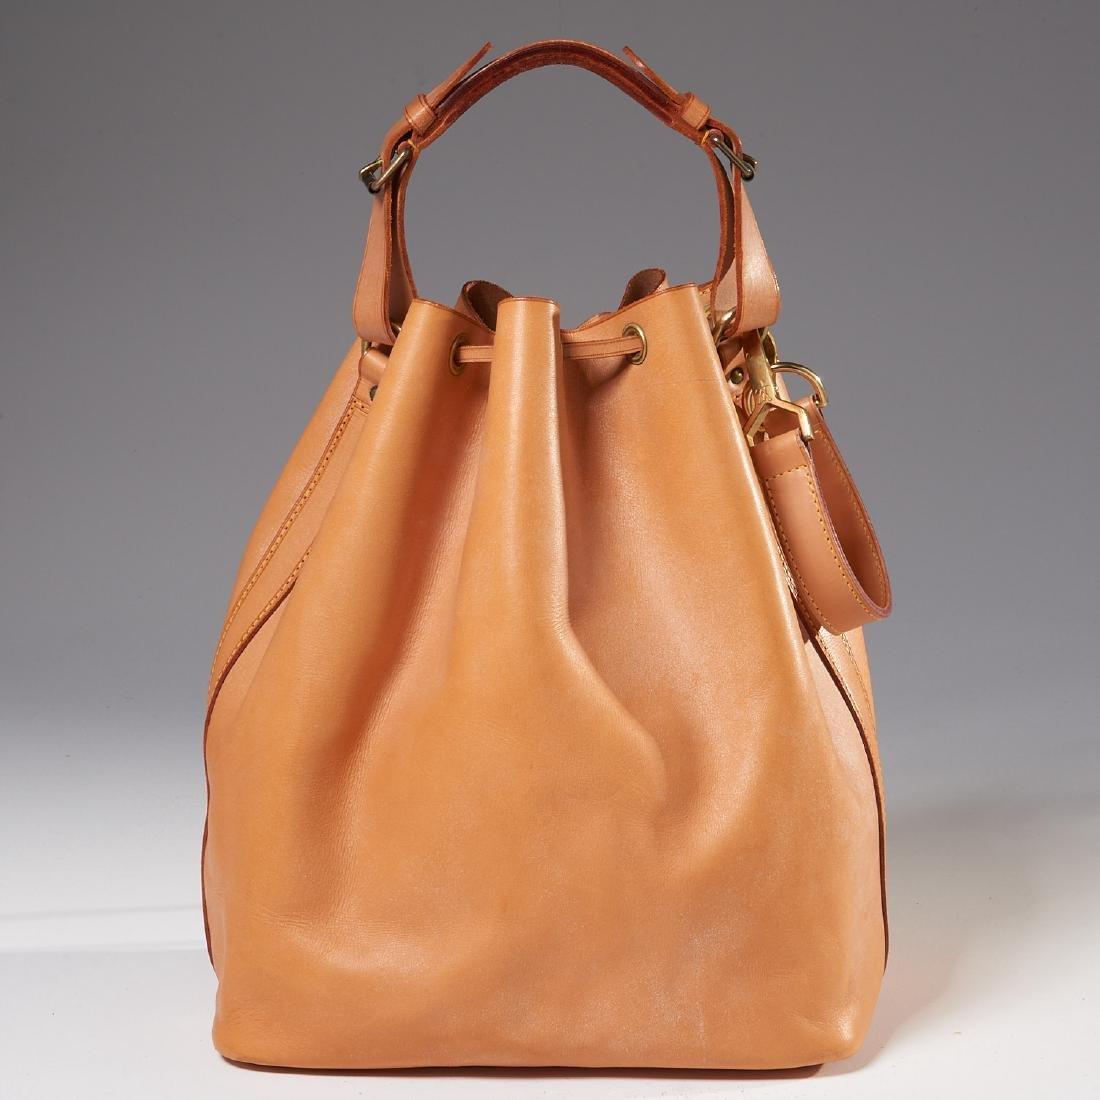 Louis Vuitton all leather drawstring handbag - 4